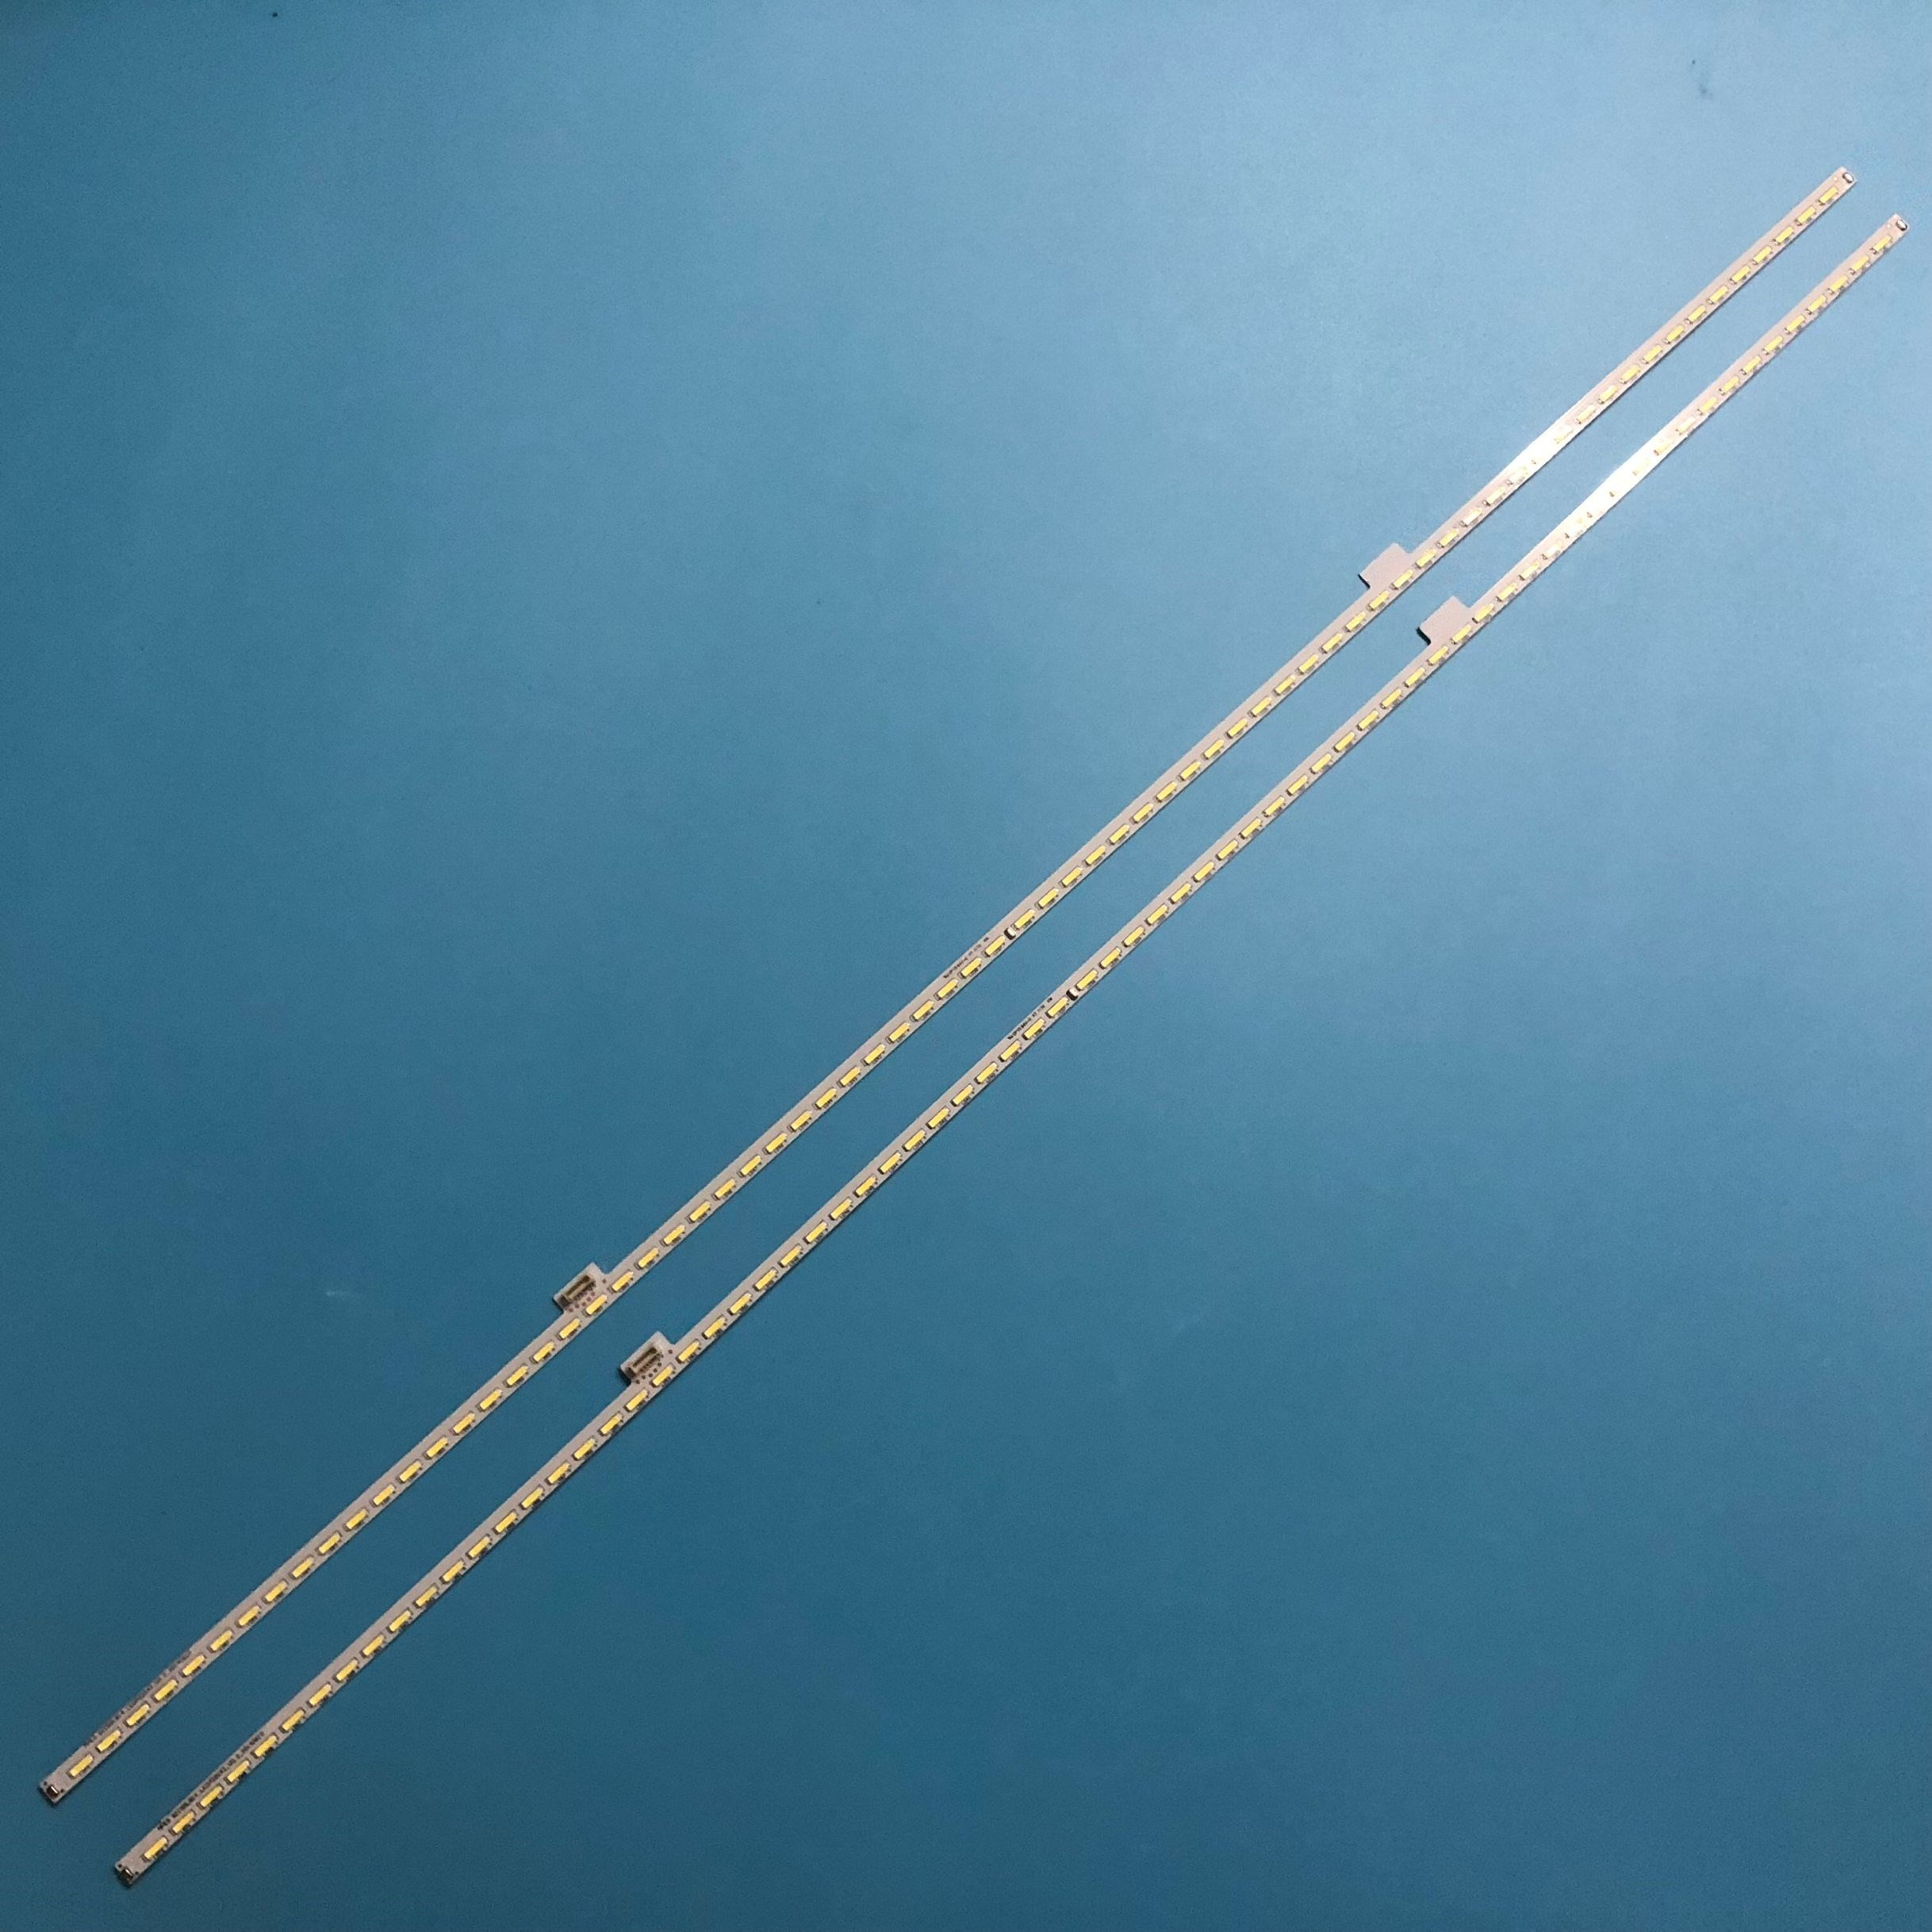 688mm LED Backlight strip 72leds ZM4C-LB5572-ZM4-PF2 40-RA6080-DRA2LG For D55A561U D55A571U L55E5700